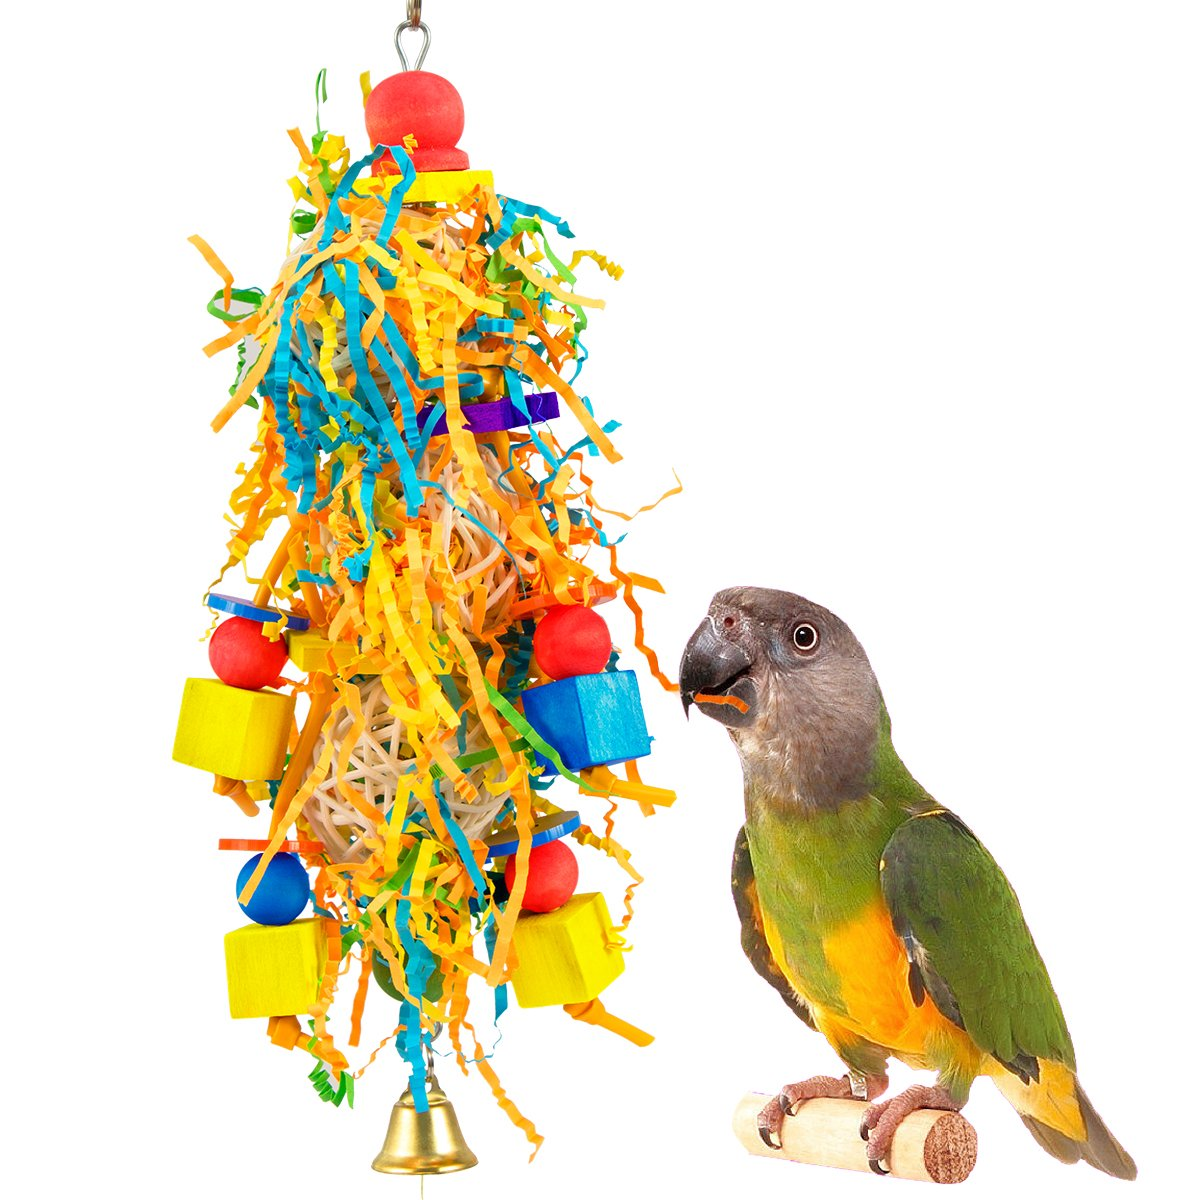 MEWTOGO Small Bird Shredder Toy - Handmade Conure Foraging Shredding Hanging Toy for Small Medium Parrots